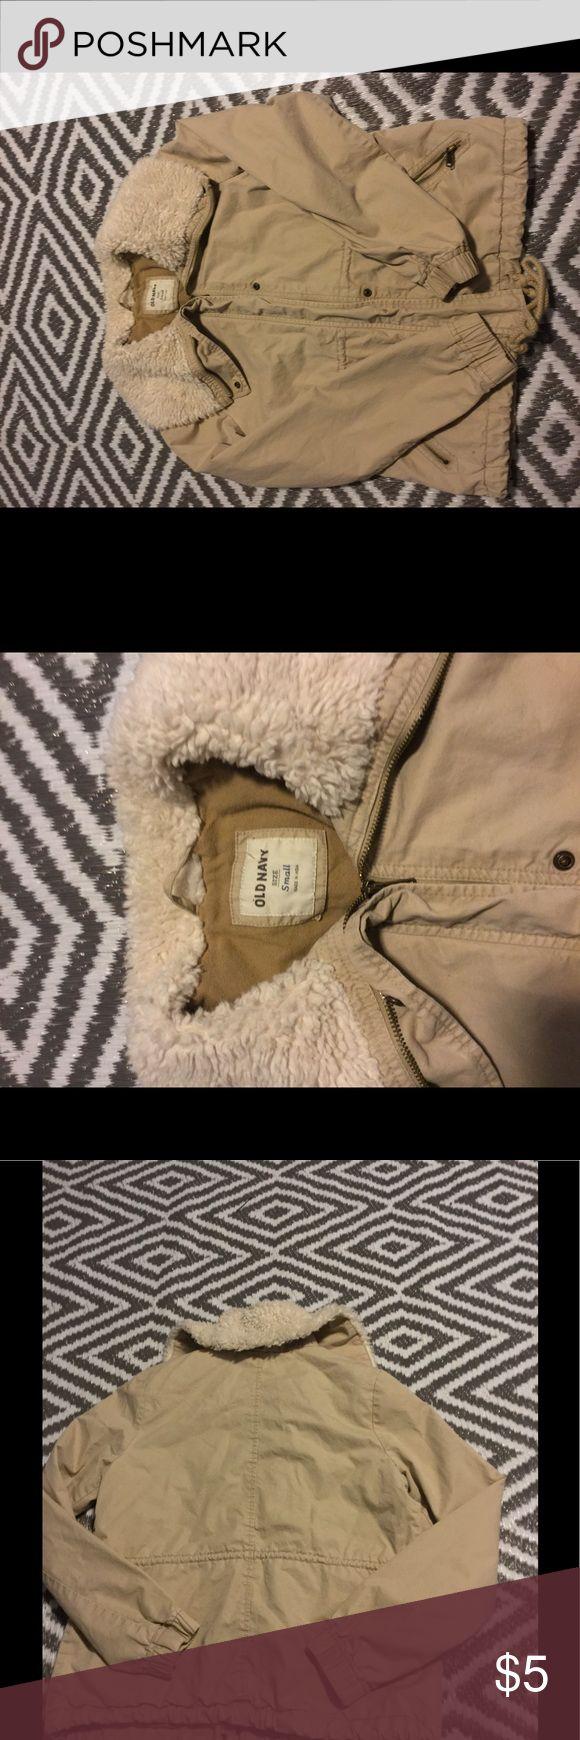 Women's size small beige jacket Women's sz small Old Navy zip up jacket Old Navy Jackets & Coats